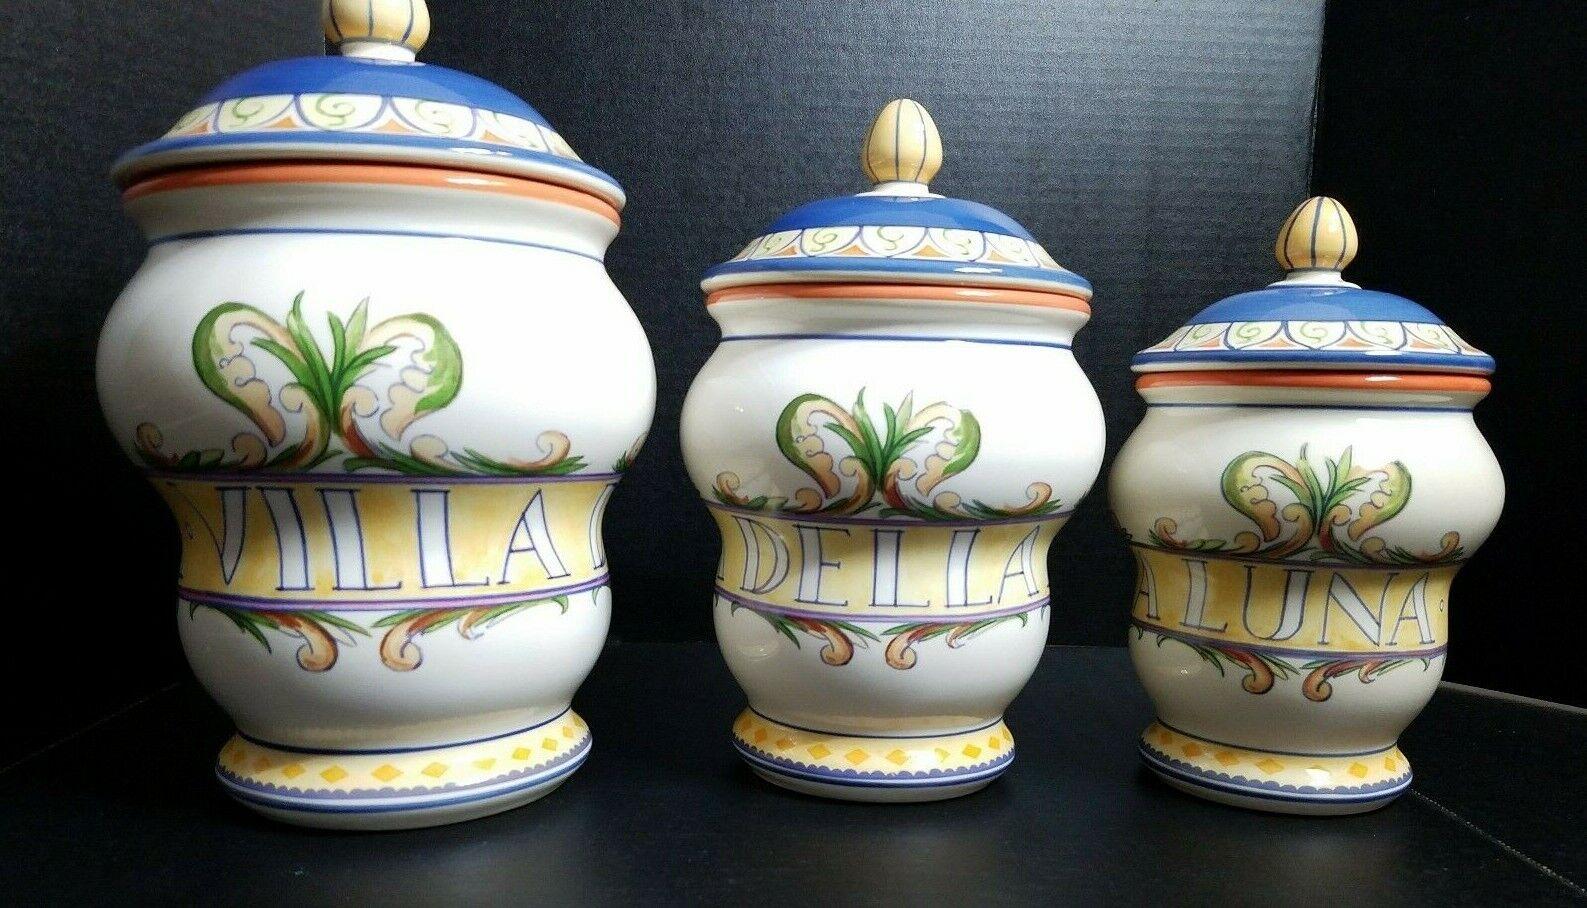 Pfaltzgraff Villa Della Luna Large 3 Piece Storage Canister Set Excellent  - $124.95